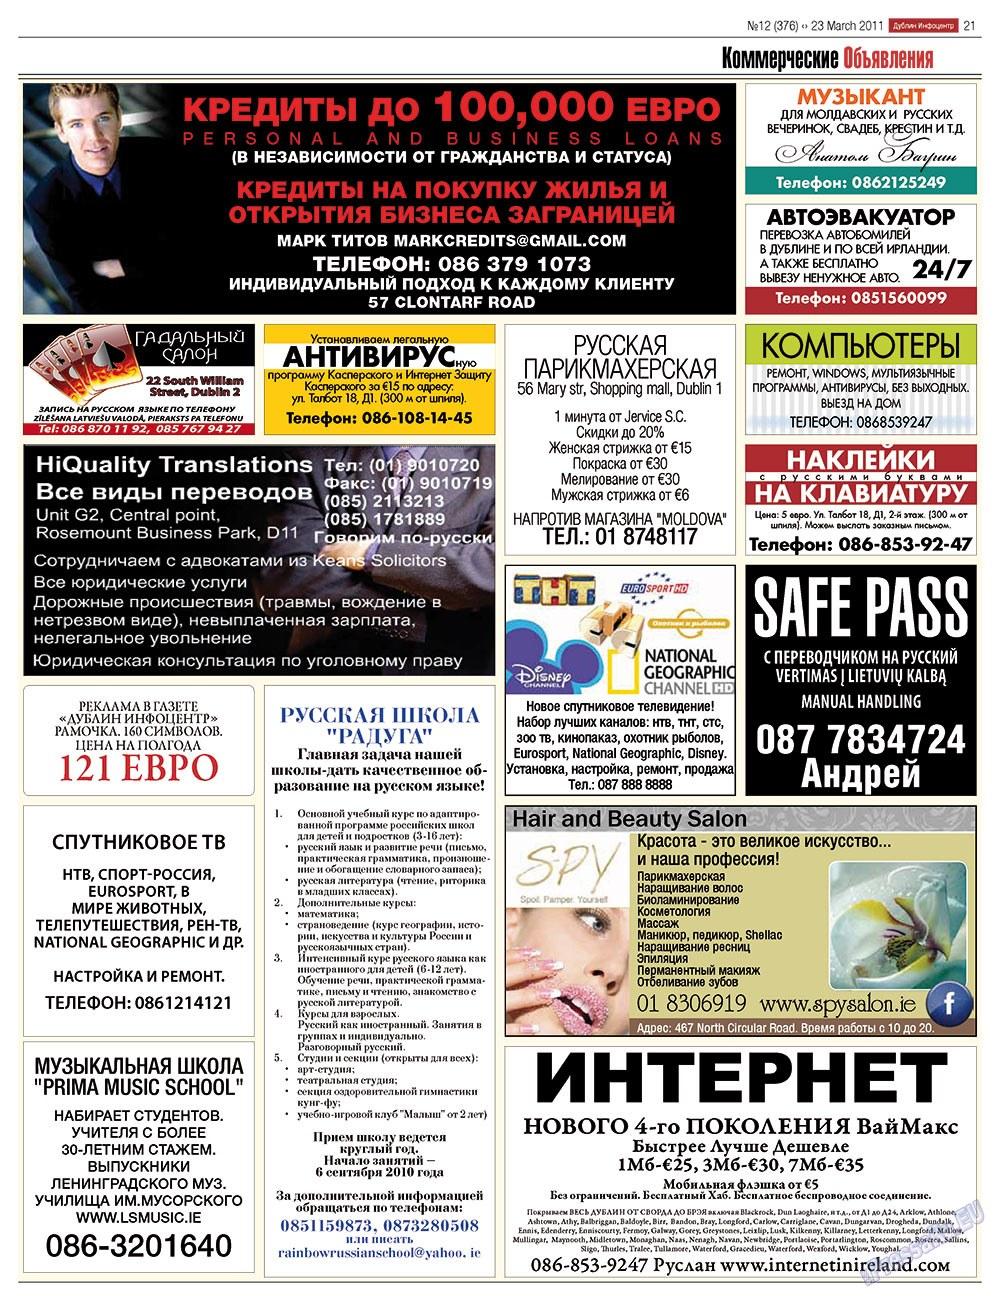 Дублин инфоцентр (газета). 2011 год, номер 12, стр. 21